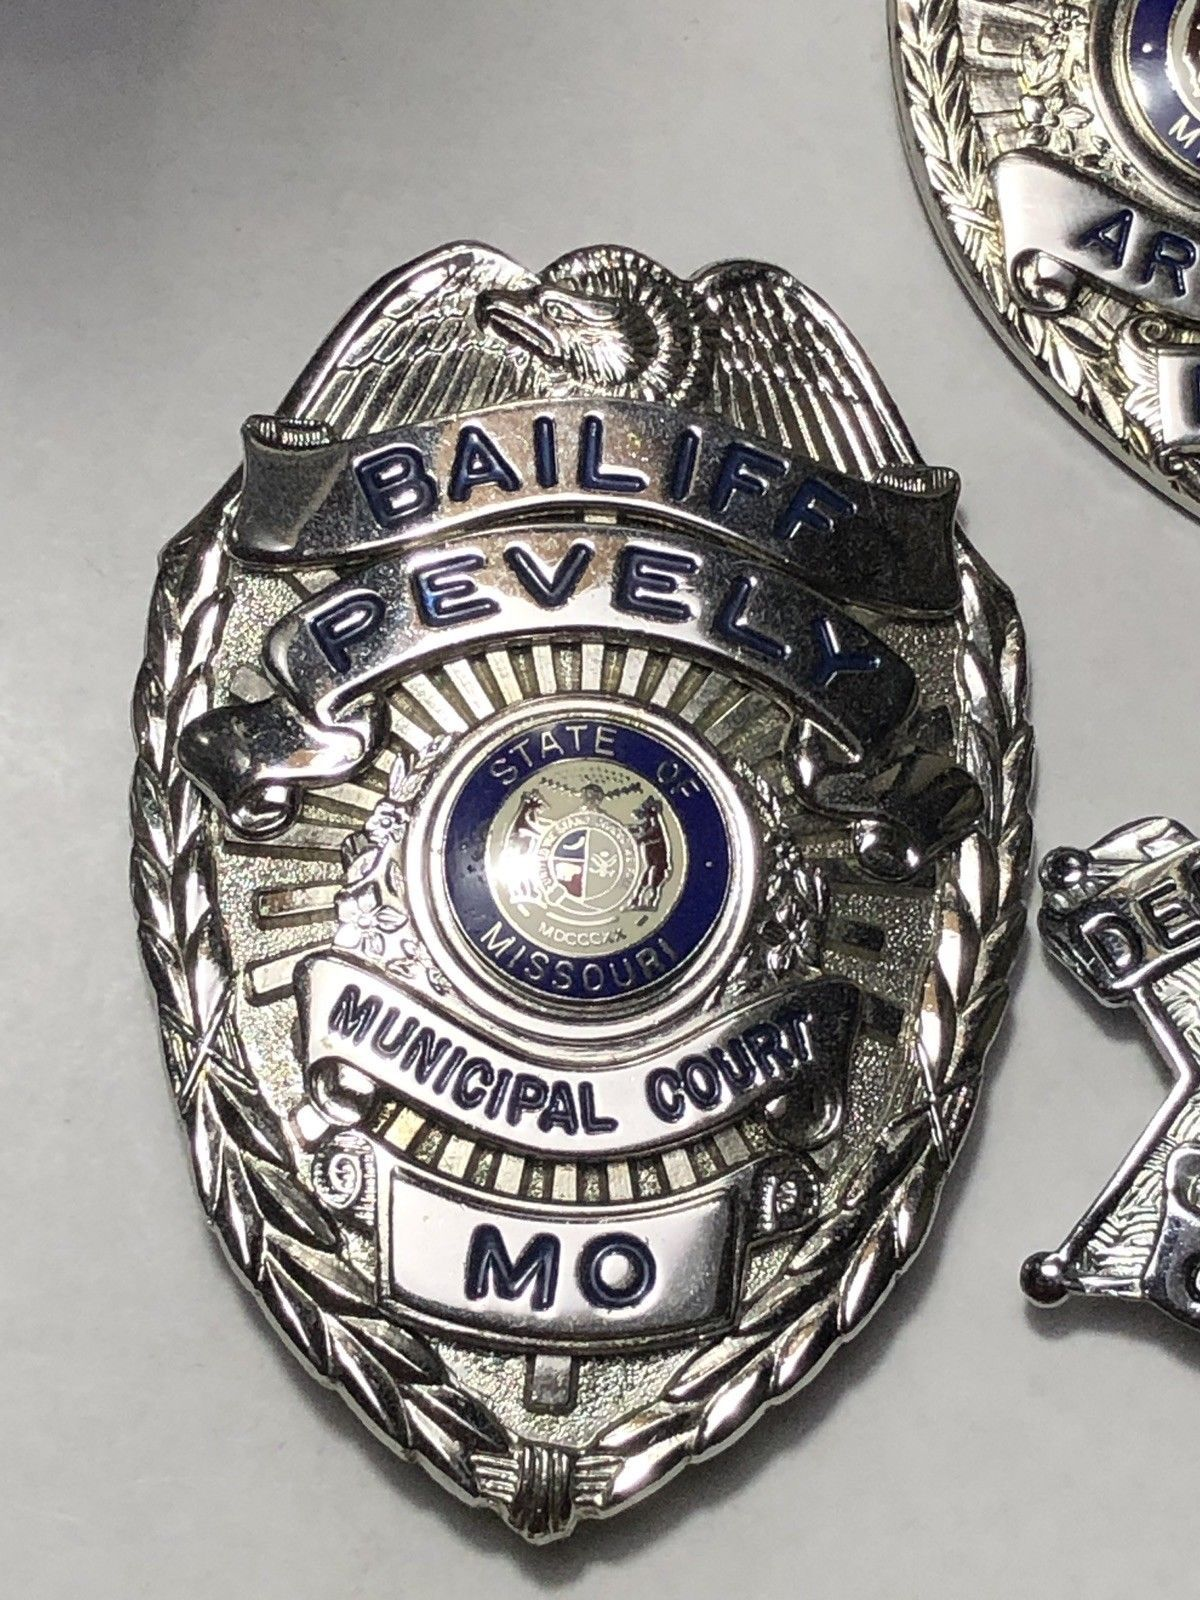 Bailiff, Pevely Municipal Court, State of Missouri (Blackinton